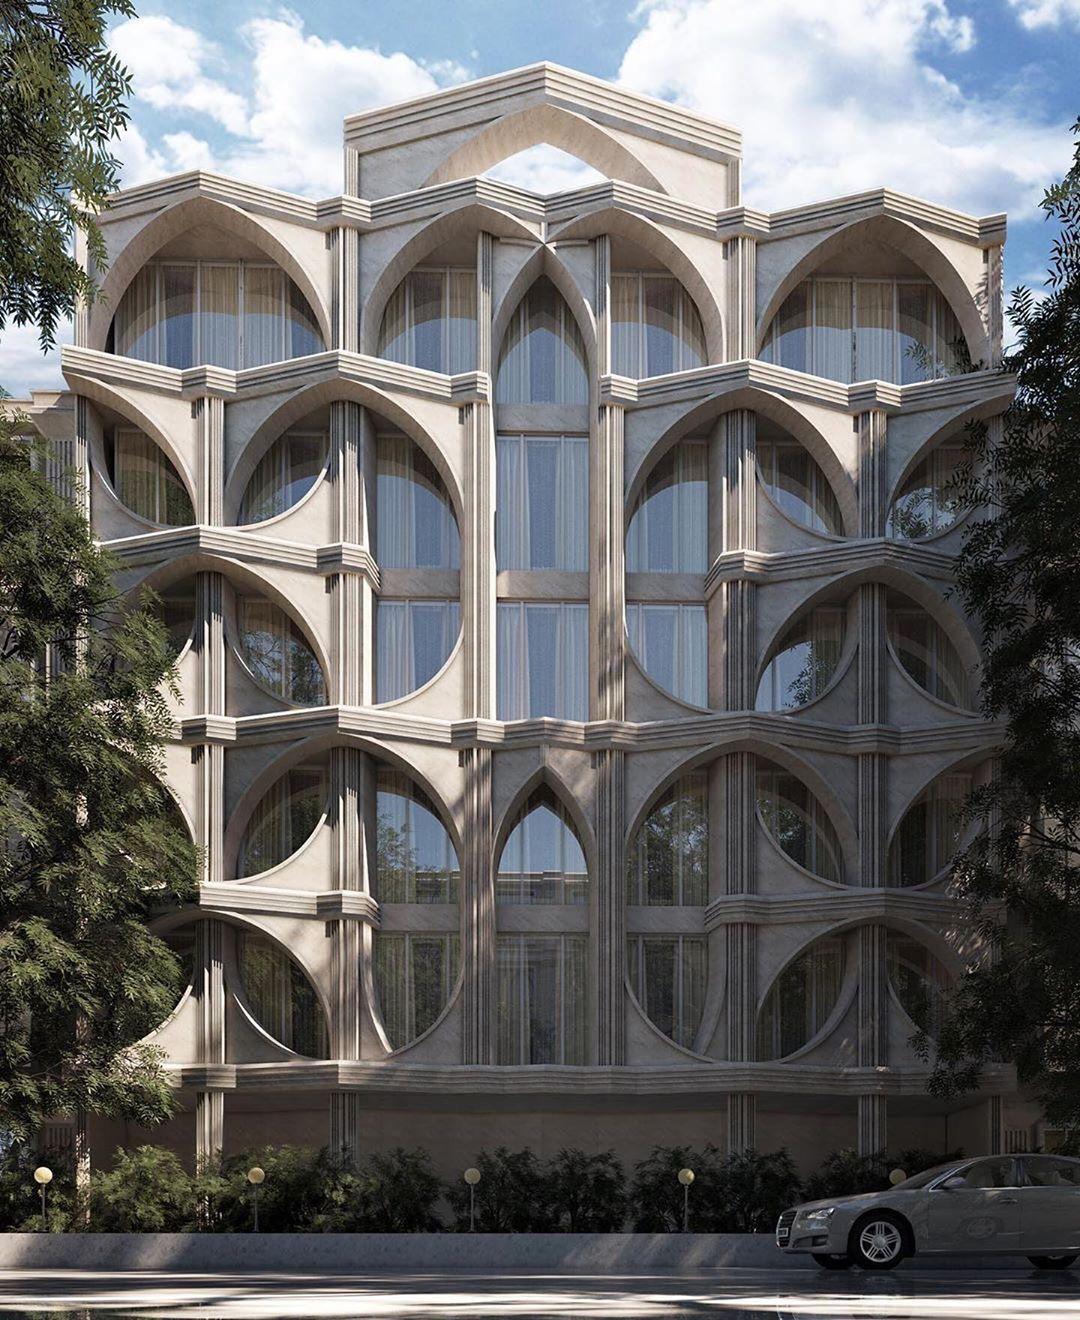 Designboom Magazine On Instagram Post Modern Iranian Facade Render By Ali Goshtasbi Rad Post Modern Architecture Amazing Architecture Facade Design